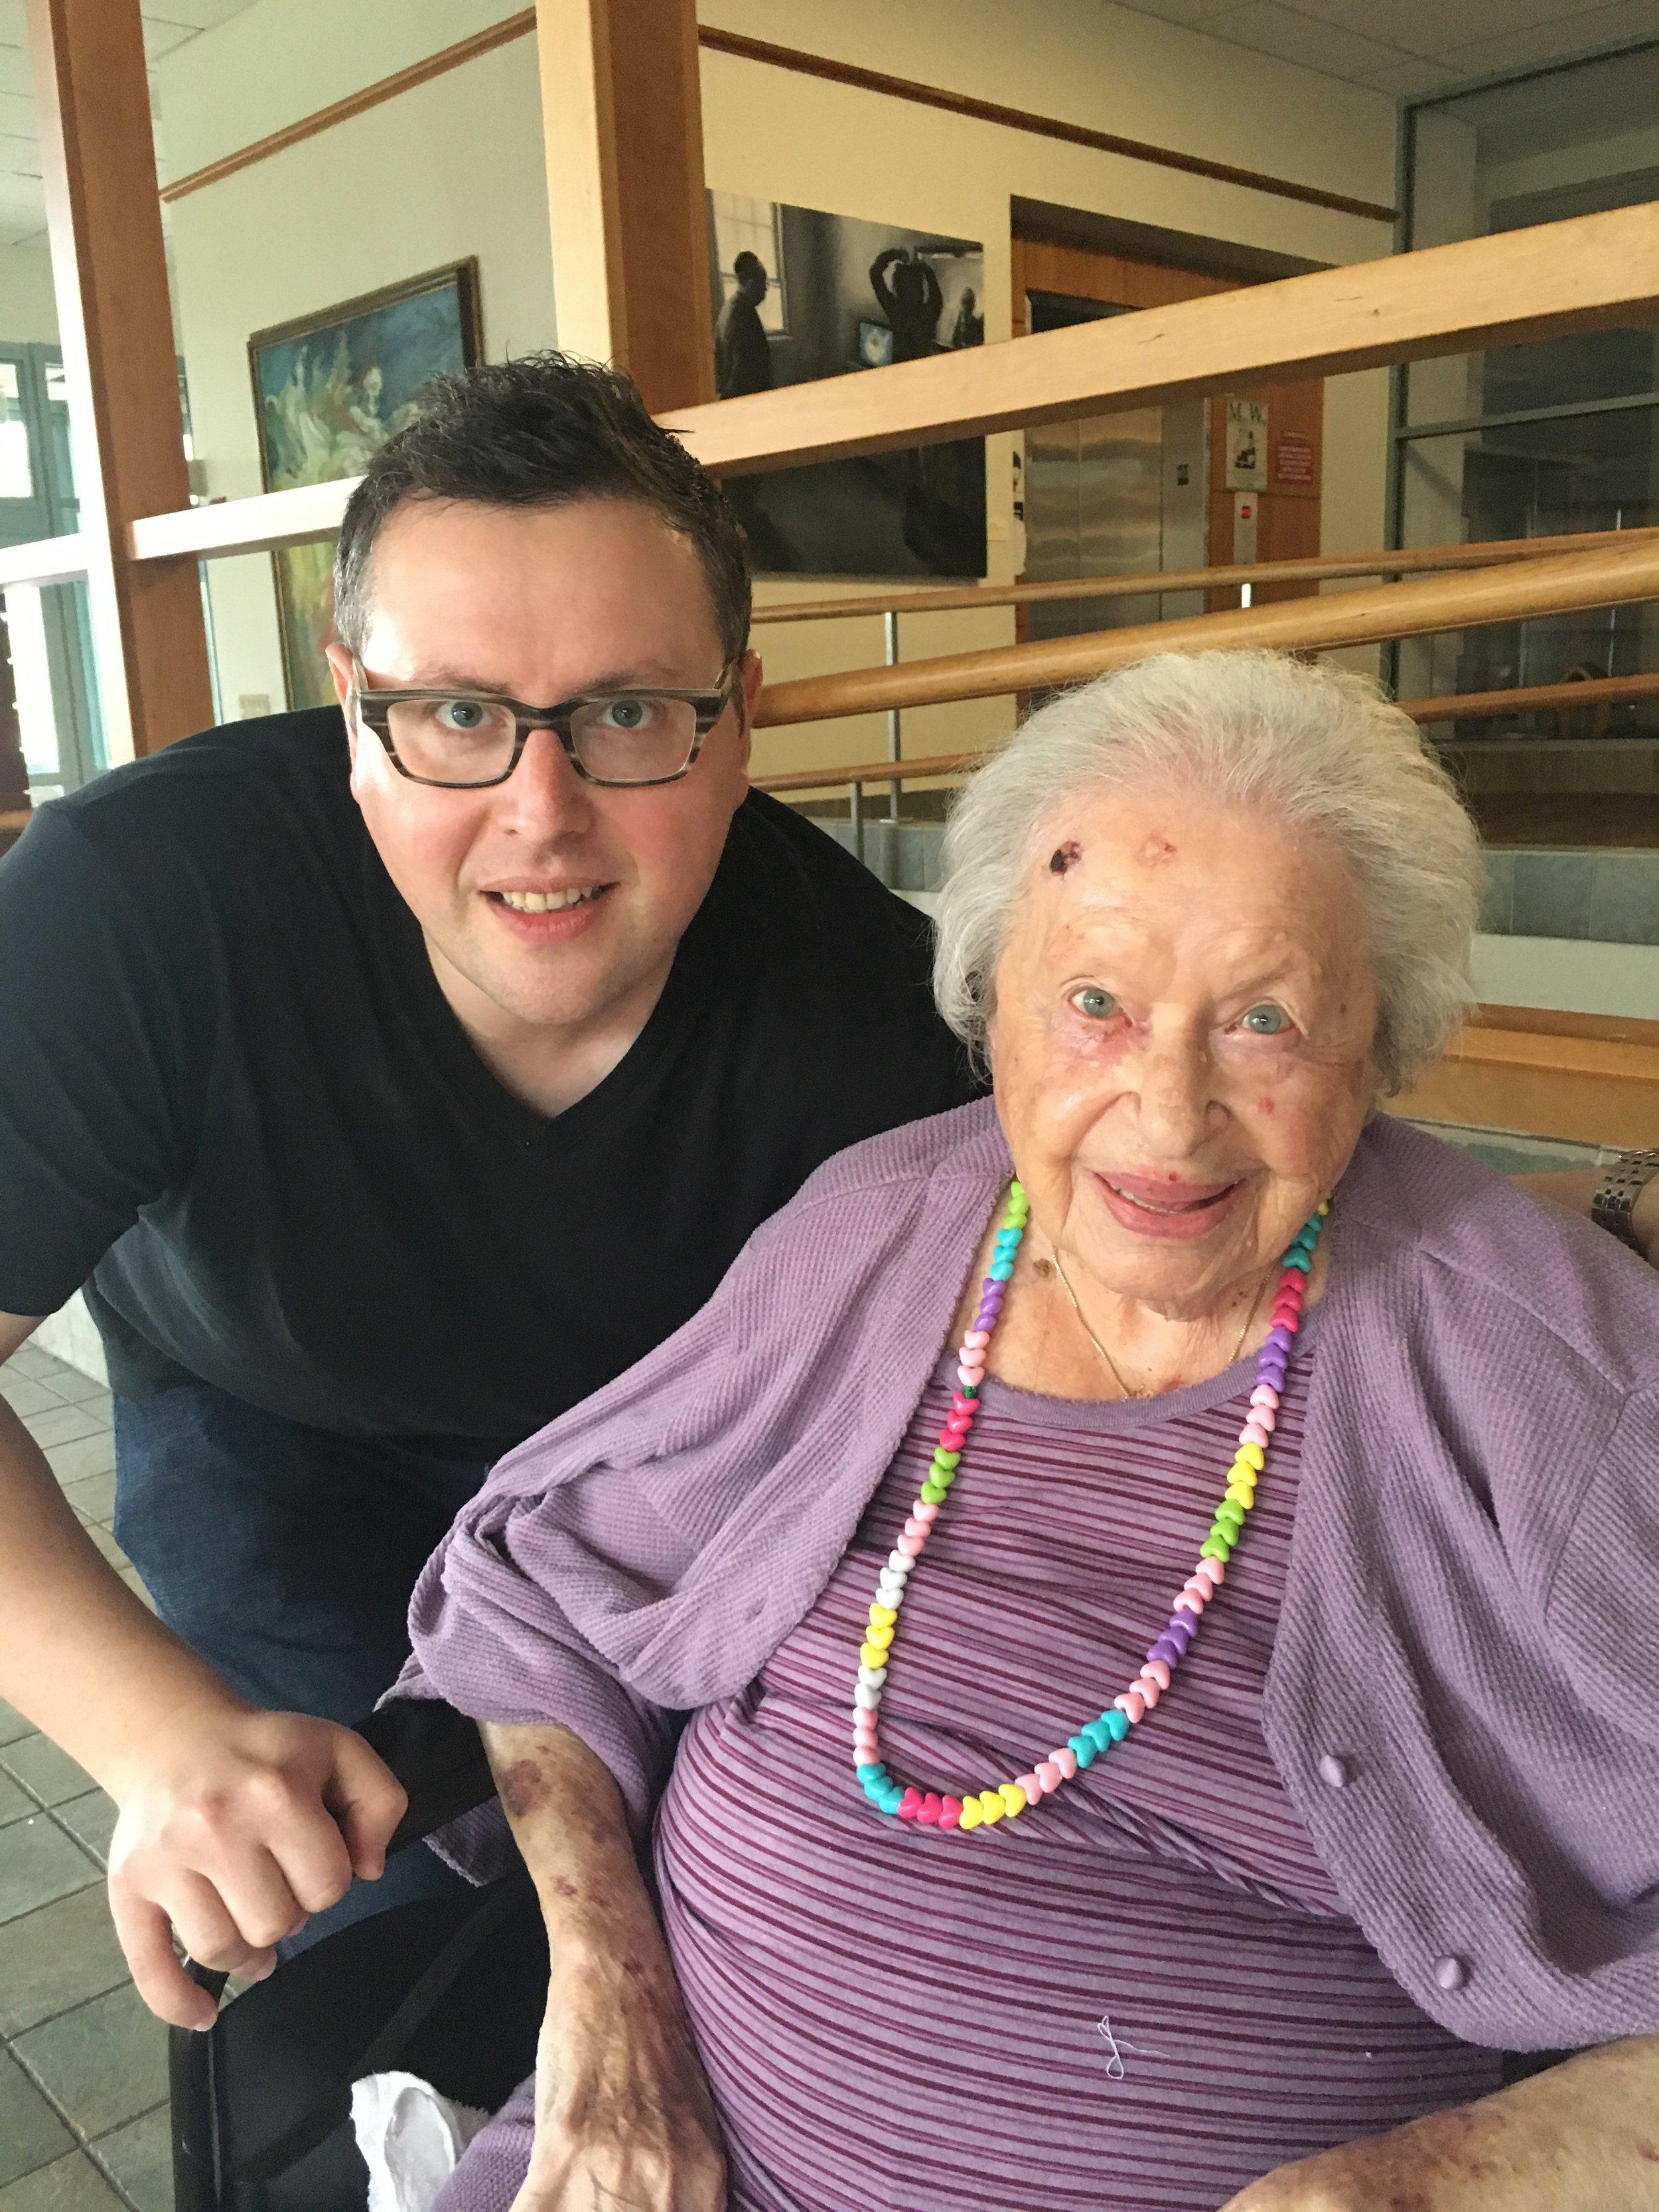 bob and grandma.JPG